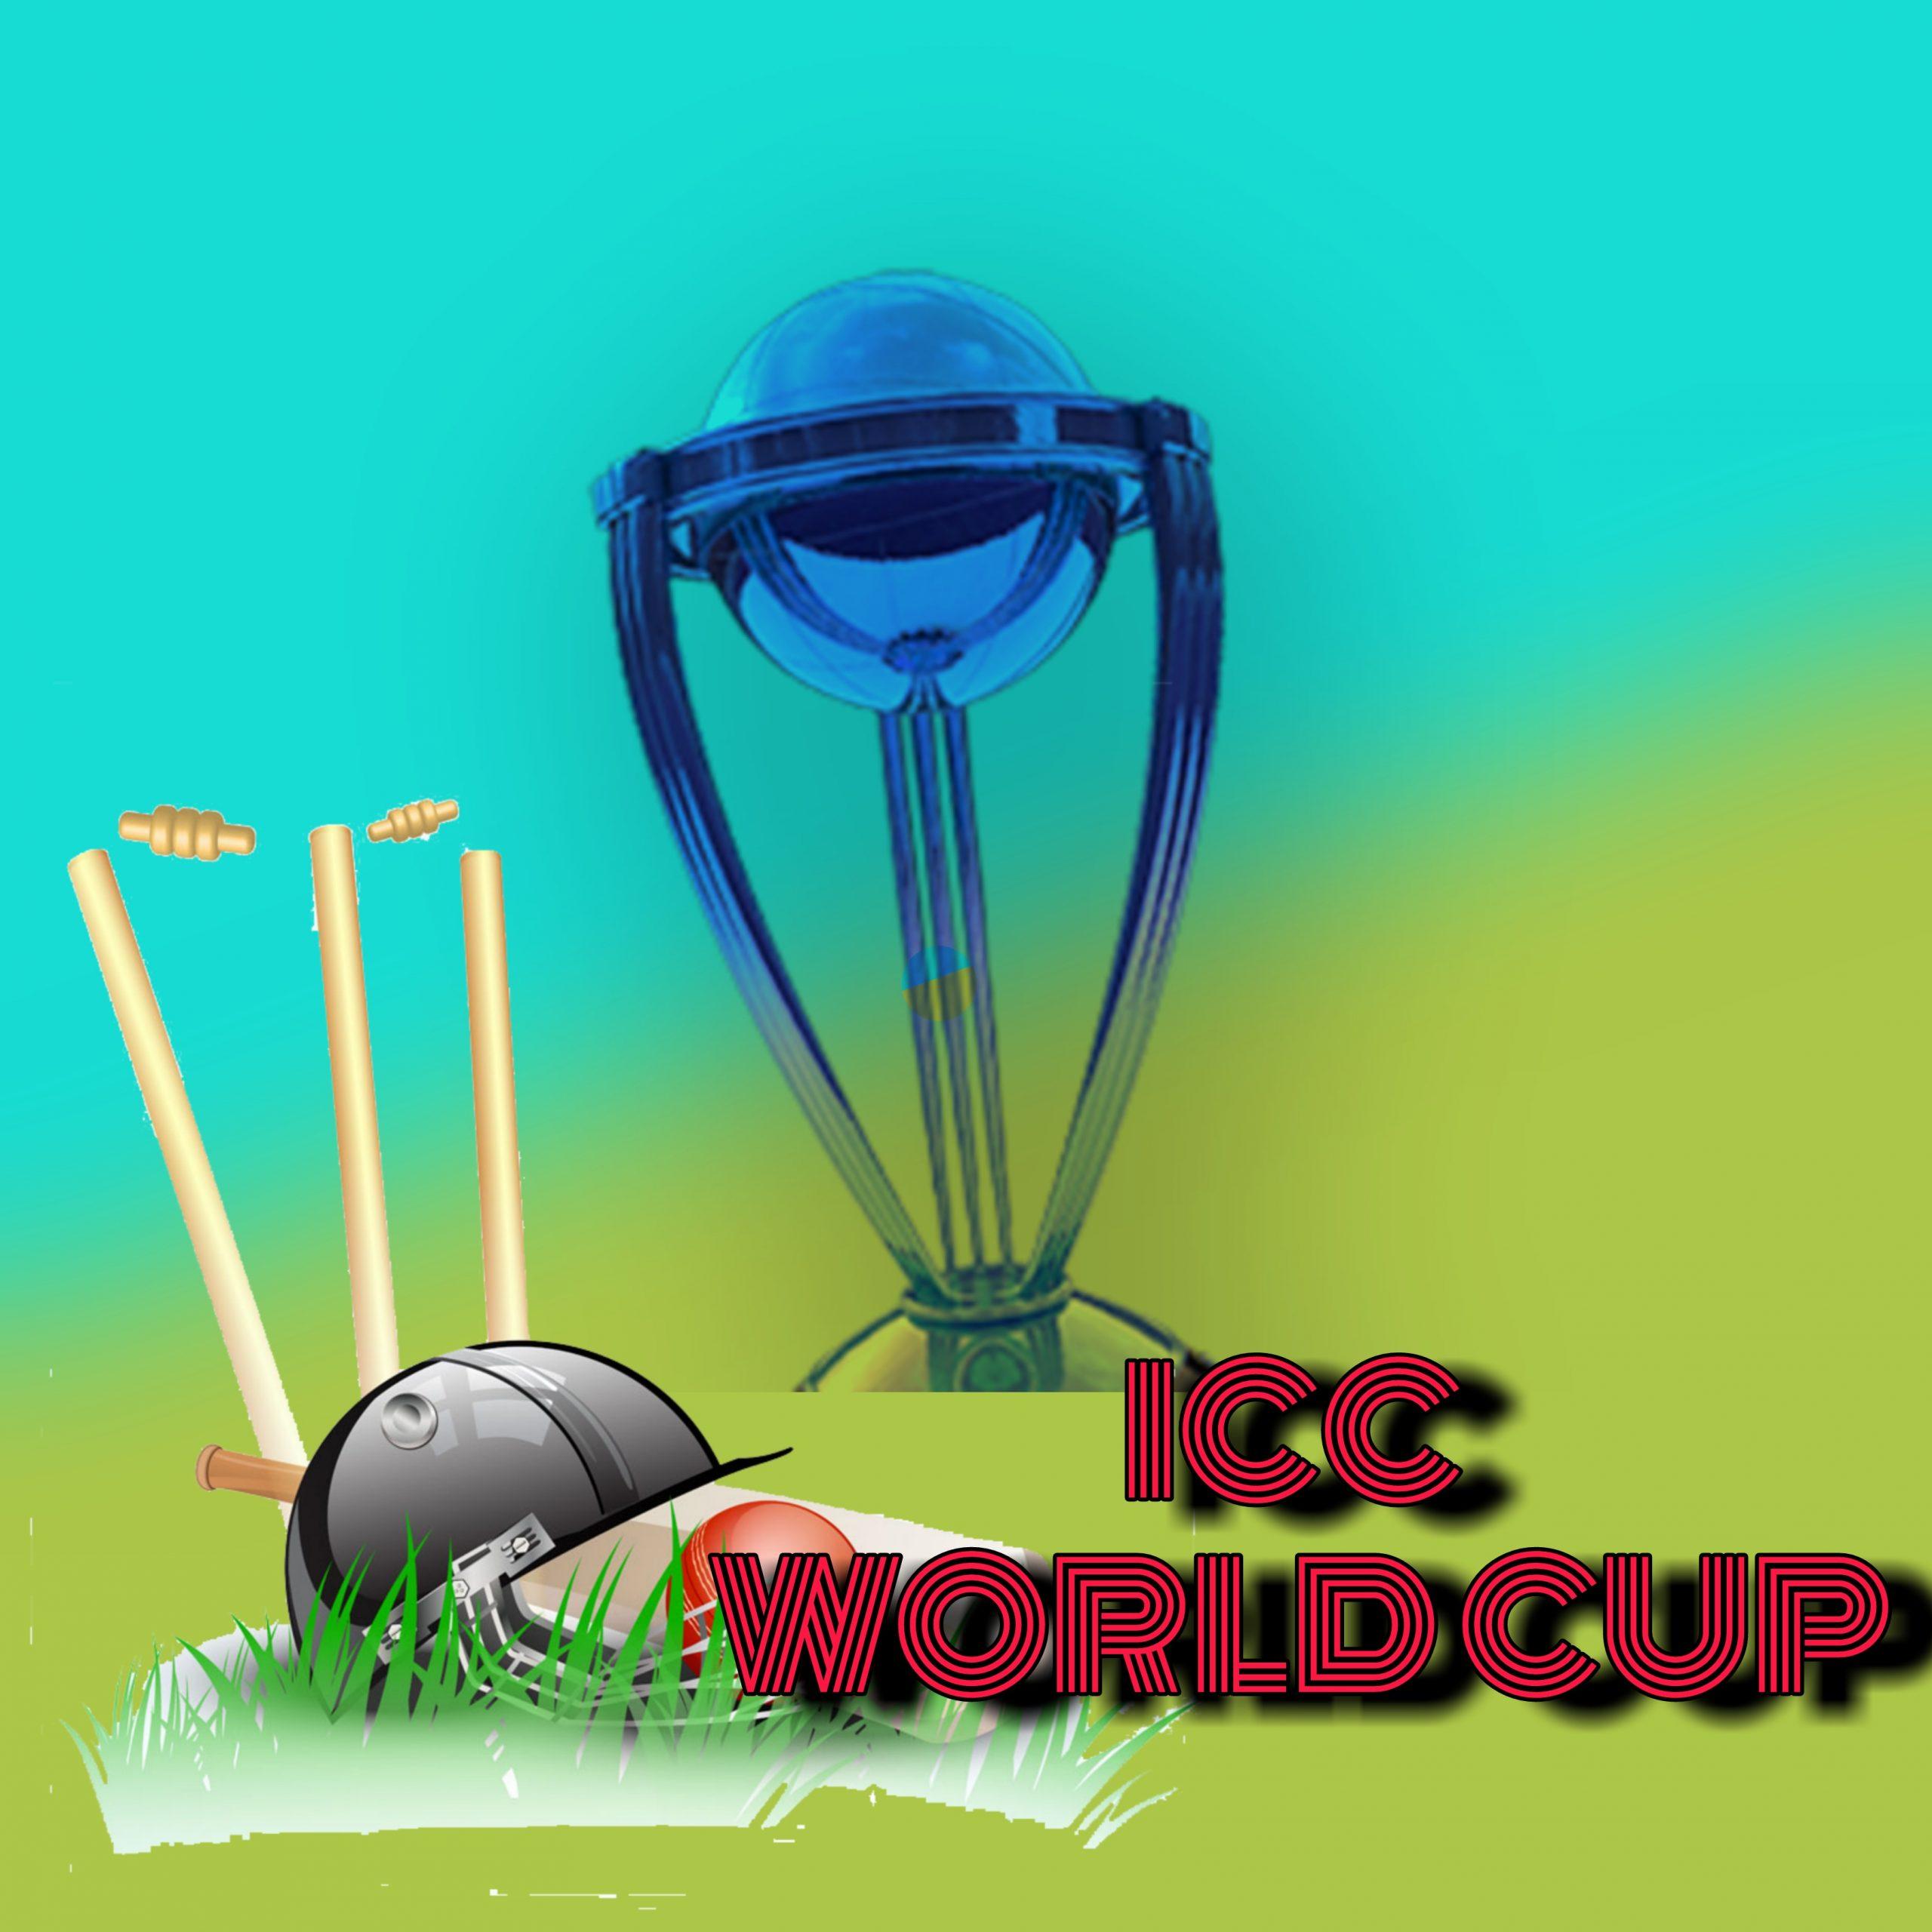 ICC WC illustration